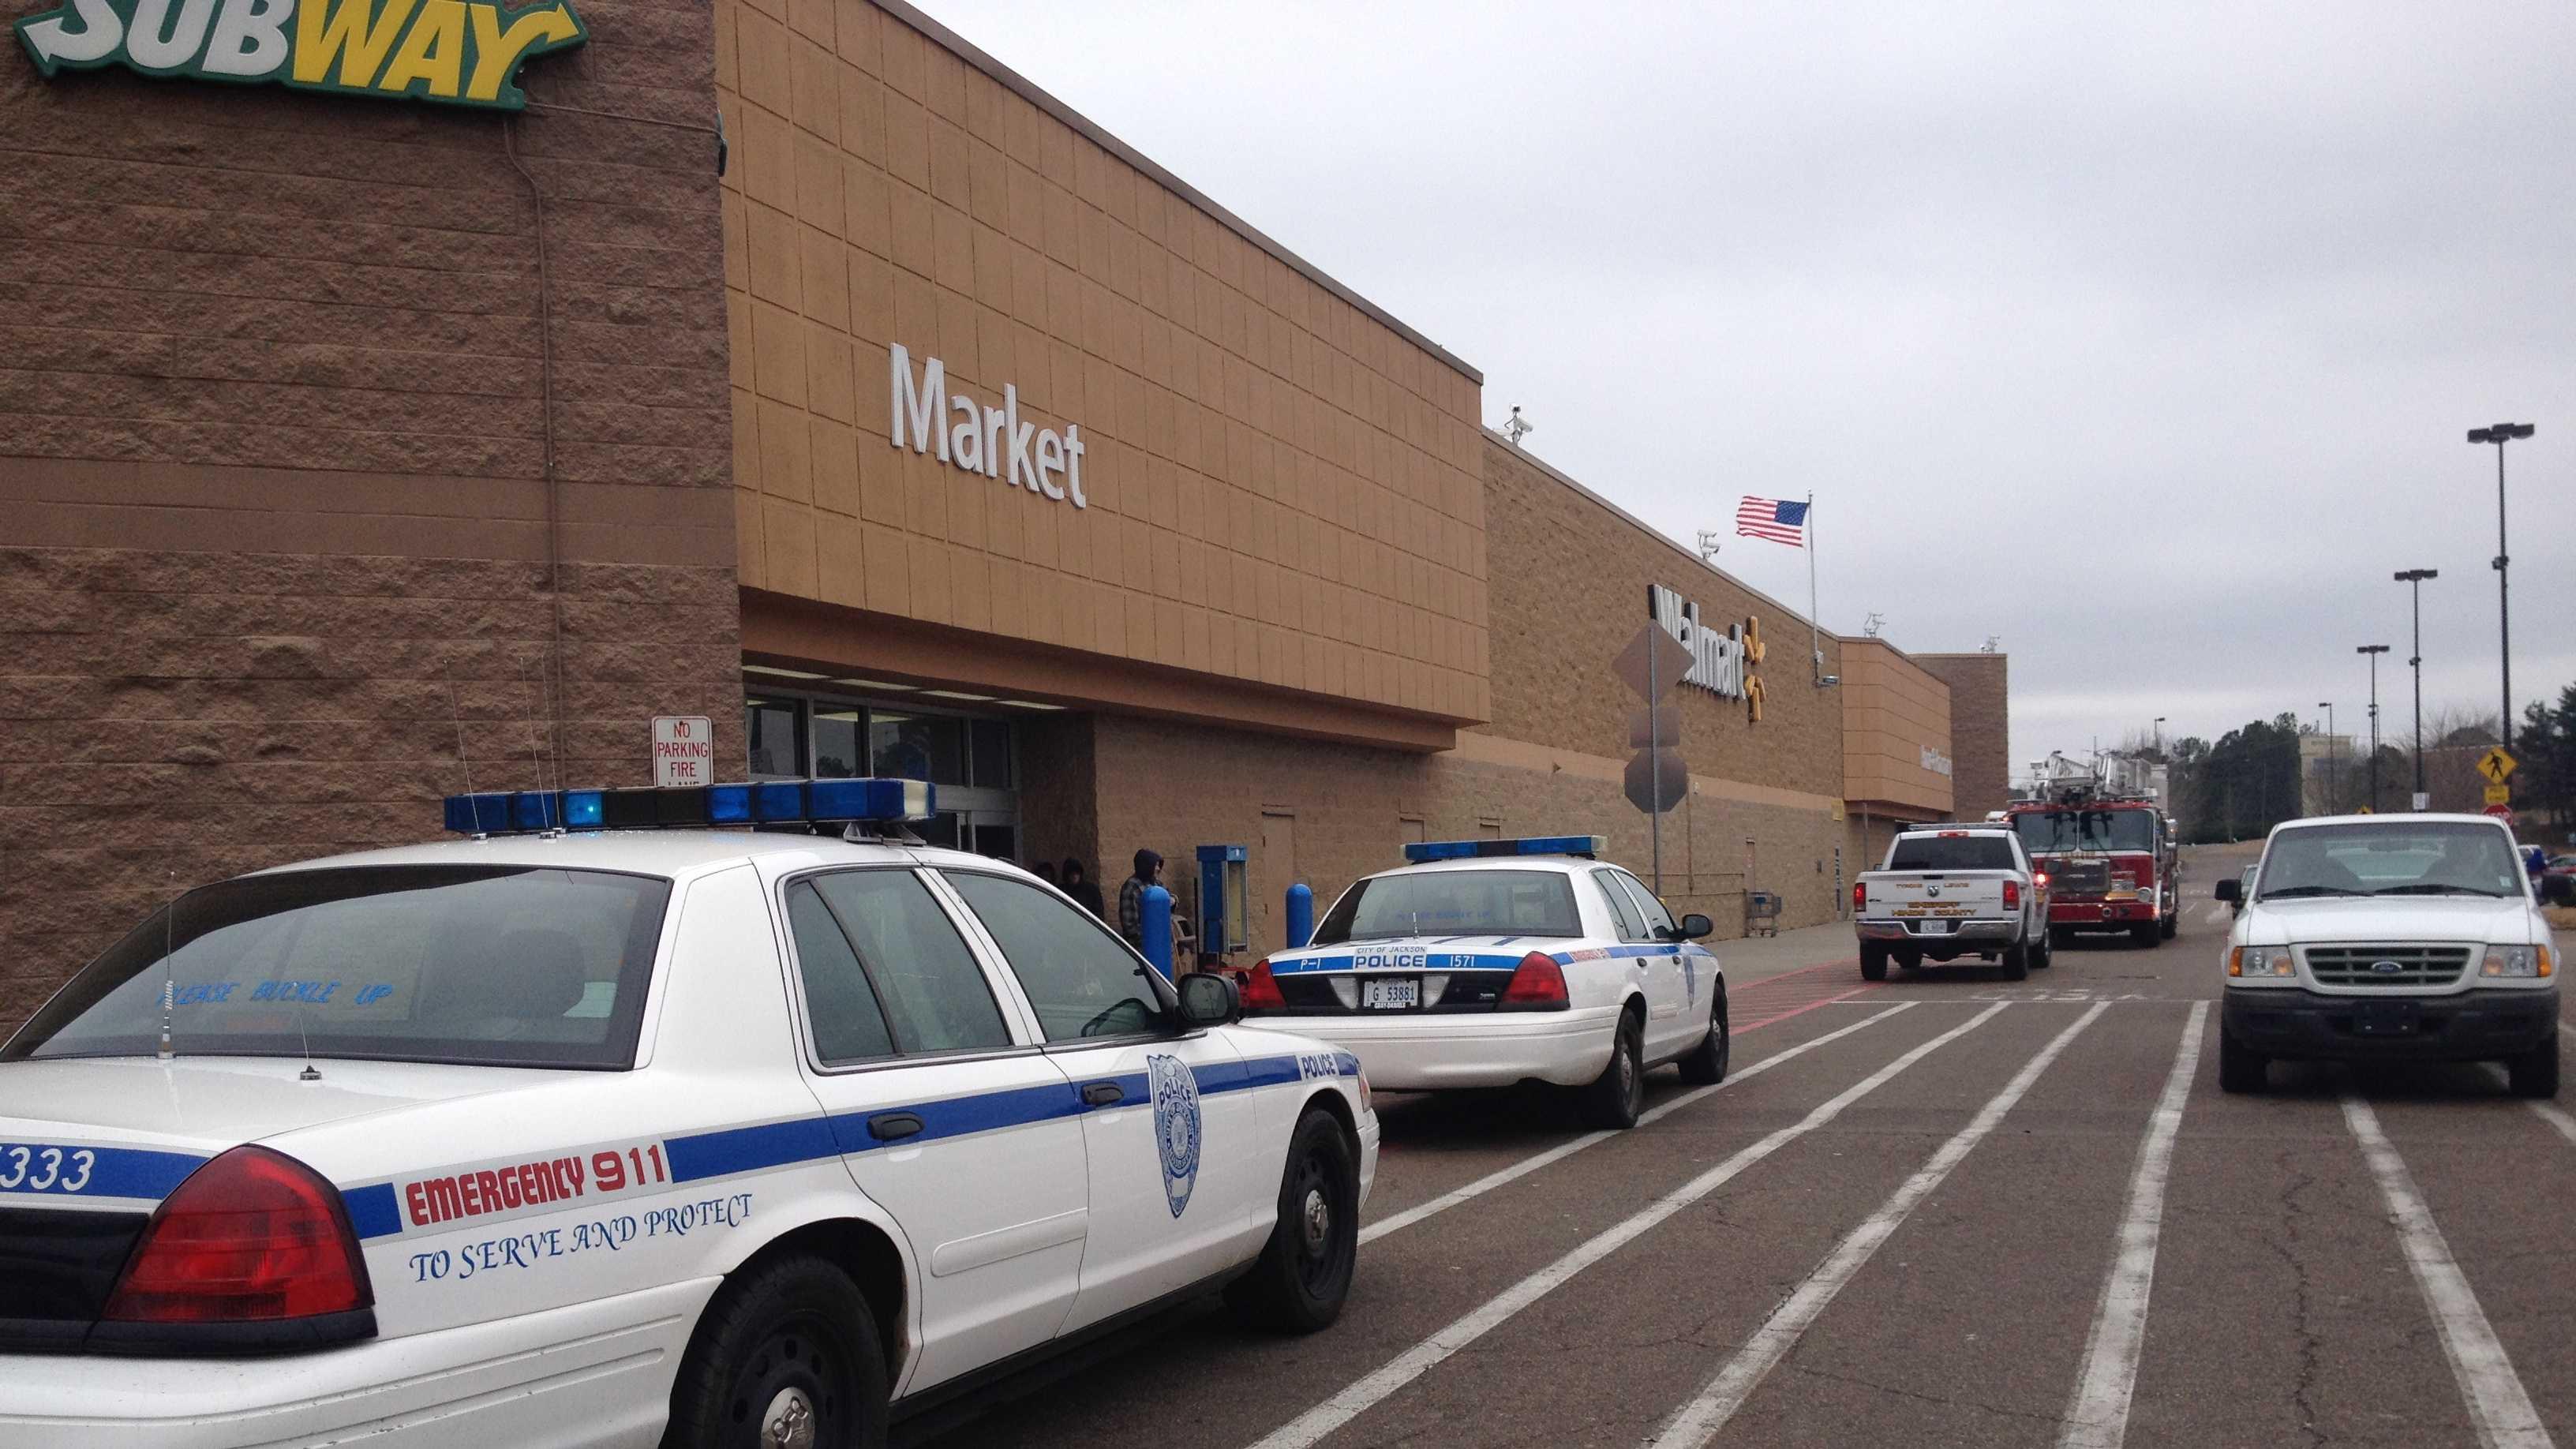 Walmart flare gun incident